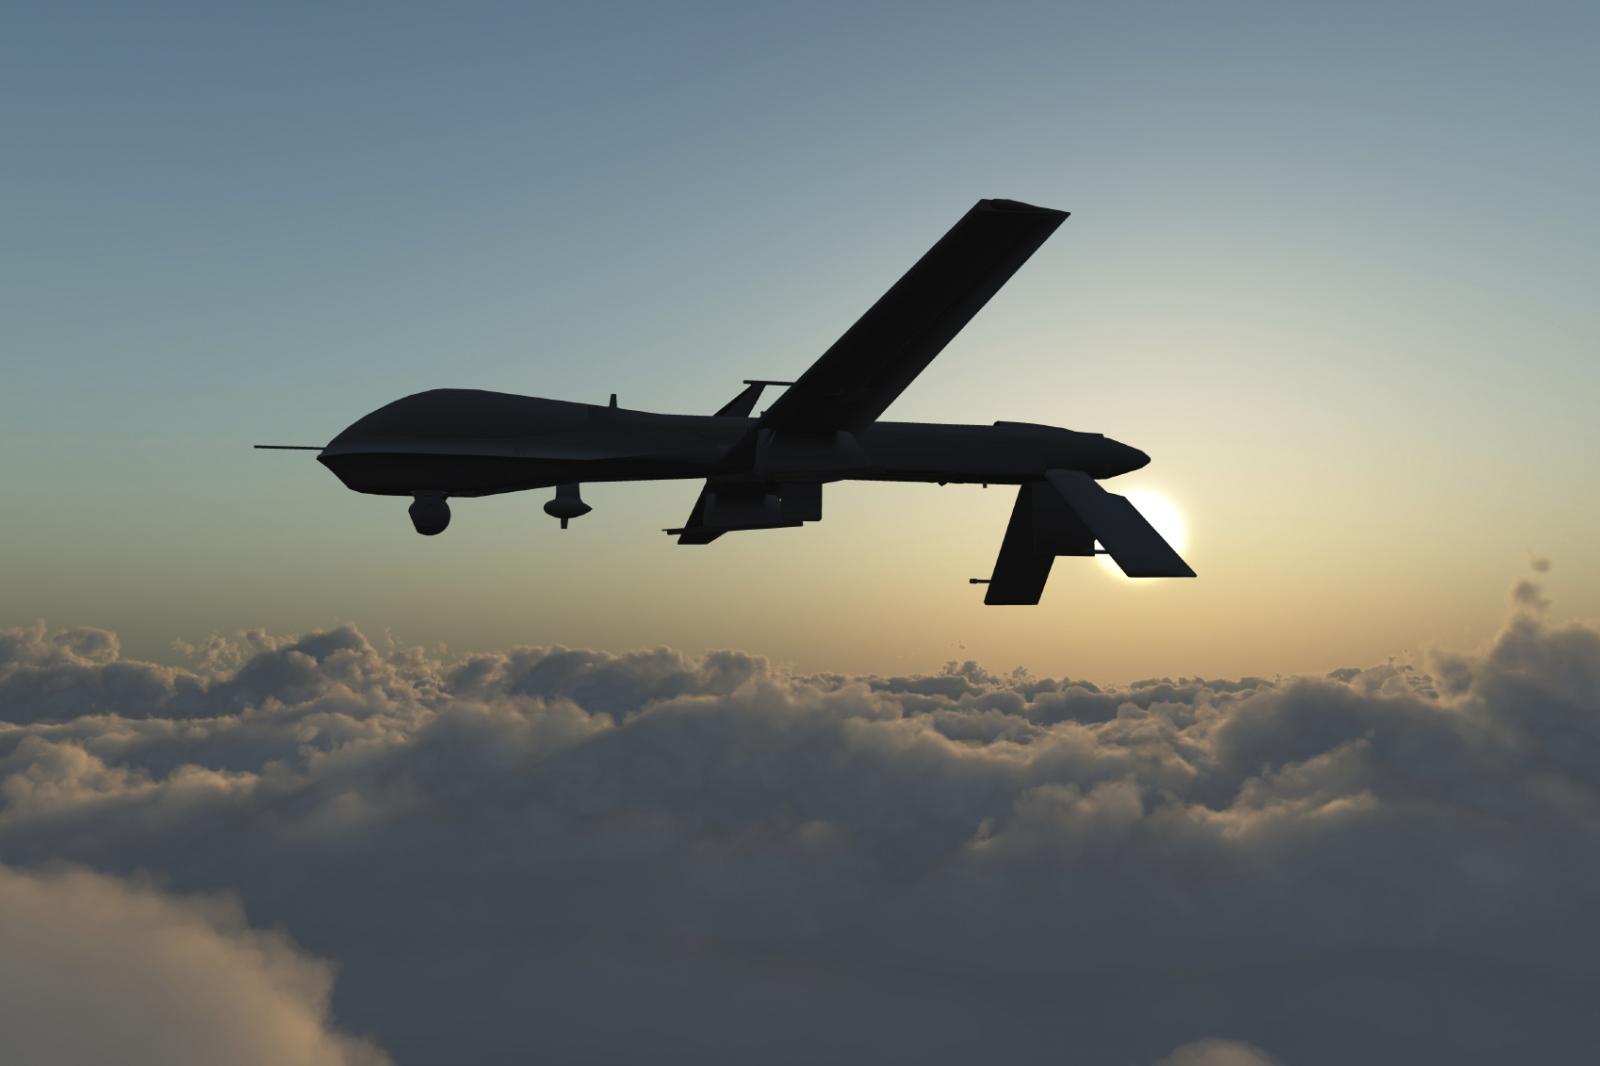 Military UAV